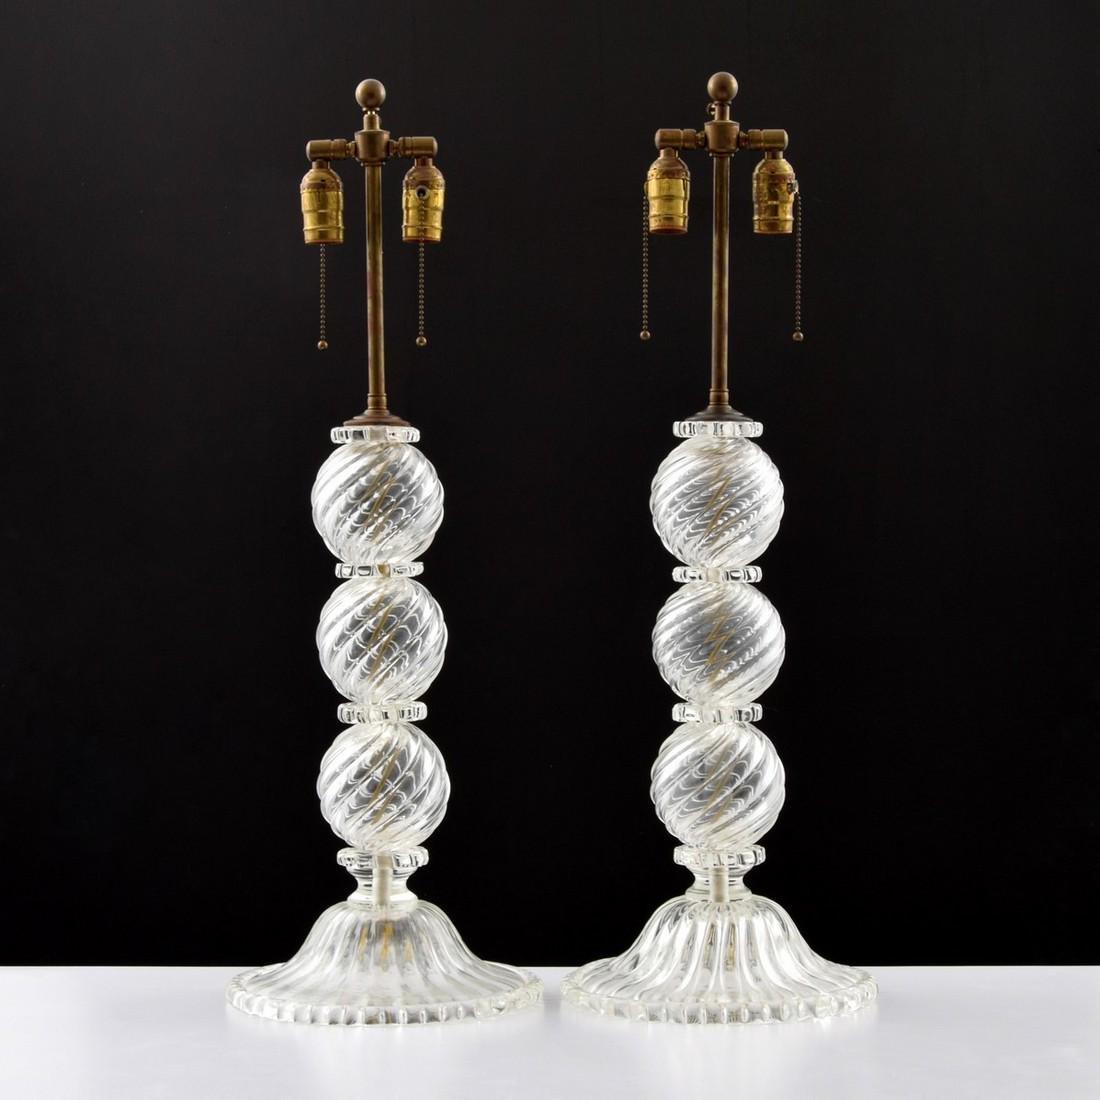 Pair of Murano Table Lamps, Manner of Venini